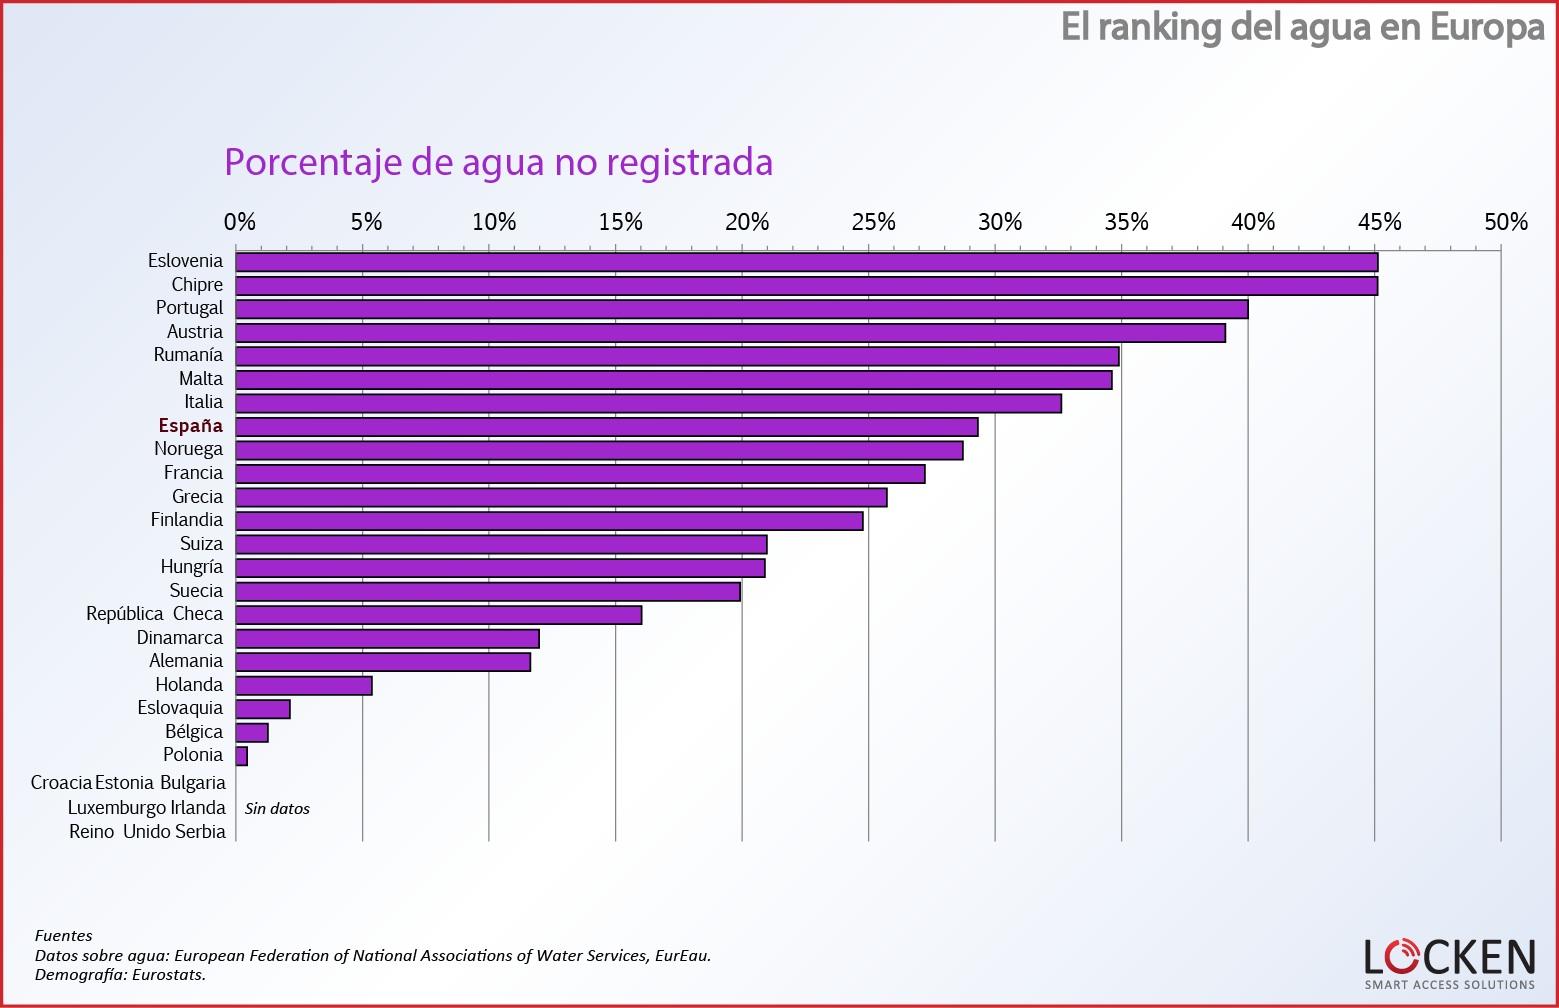 ranking-agua-europa-agua-no-registrada-porcentaje 8